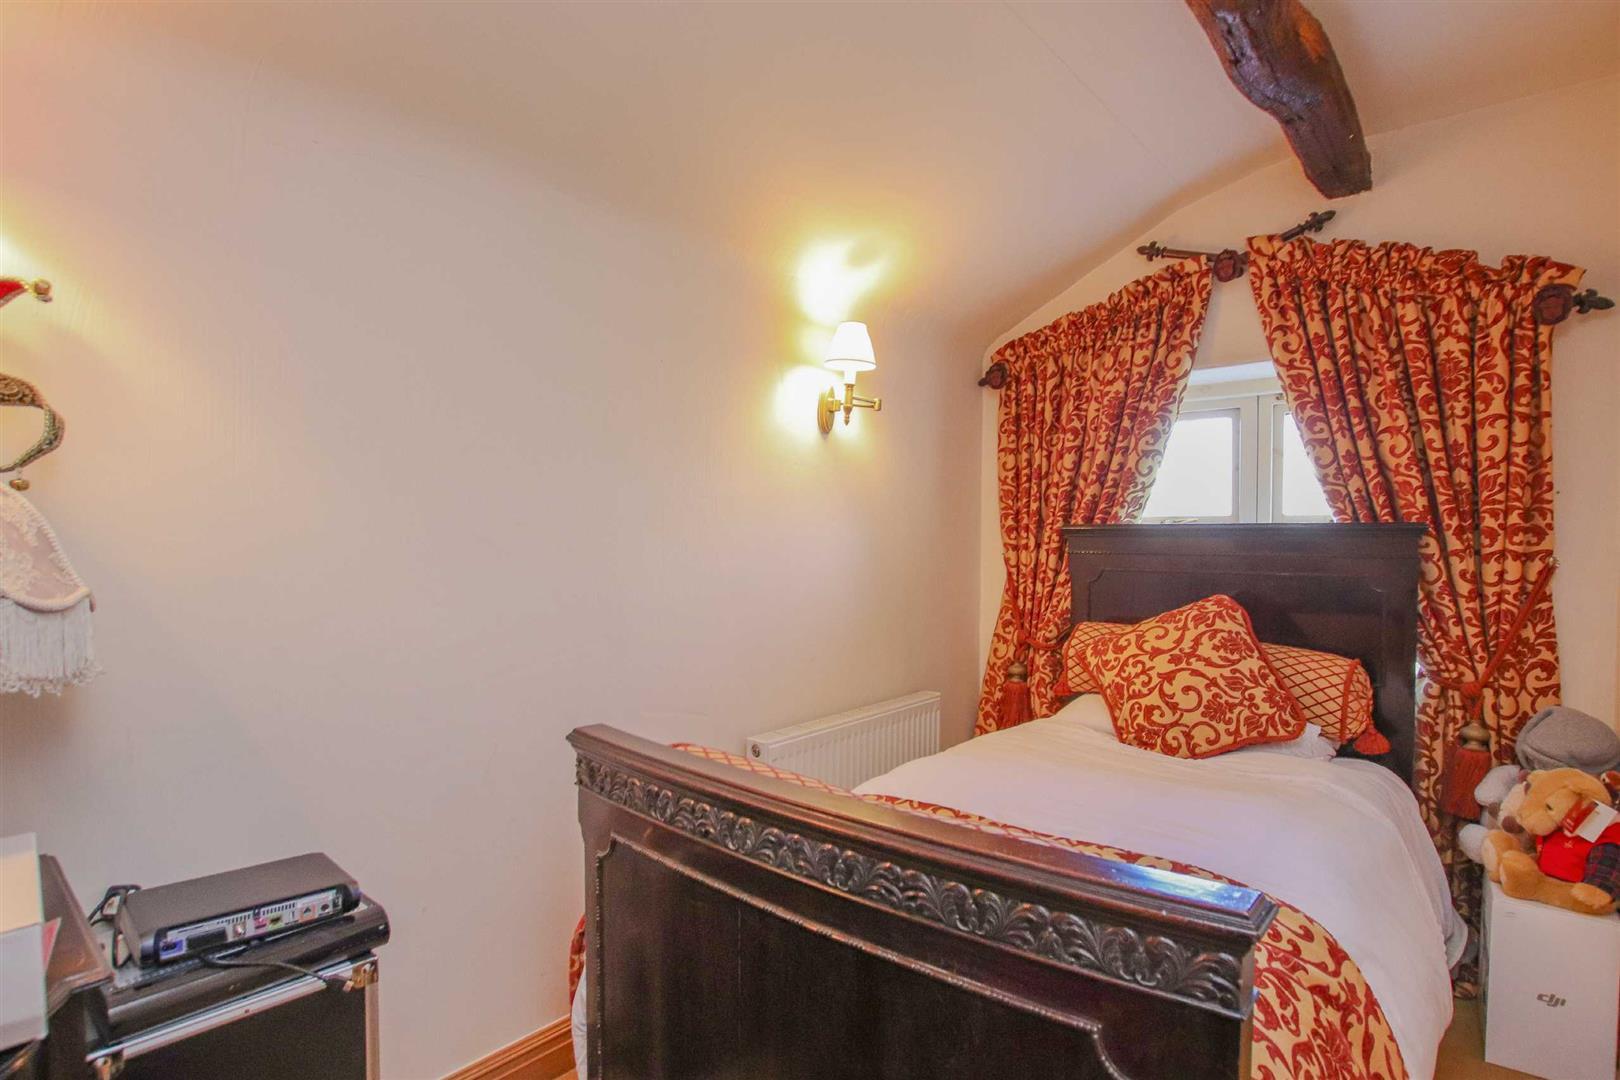 3 Bedroom Semi-detached House For Sale - p038856_17.jpg